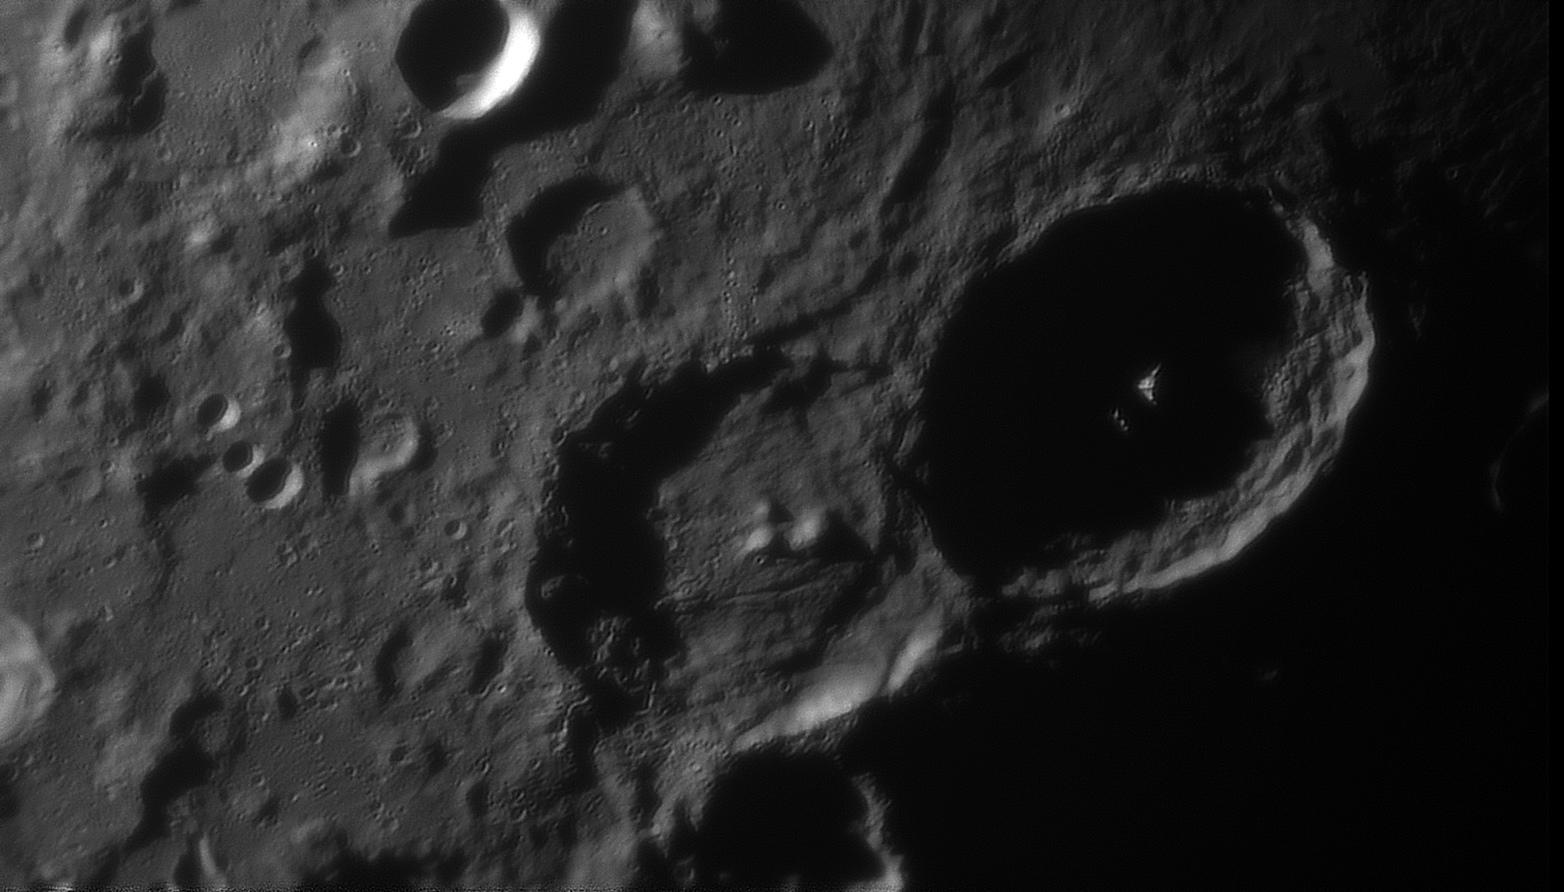 large.moon_19_09_2019_02_06_Theop.jpg.8e384a8f96f813e0614d43cc25c825c2.jpg